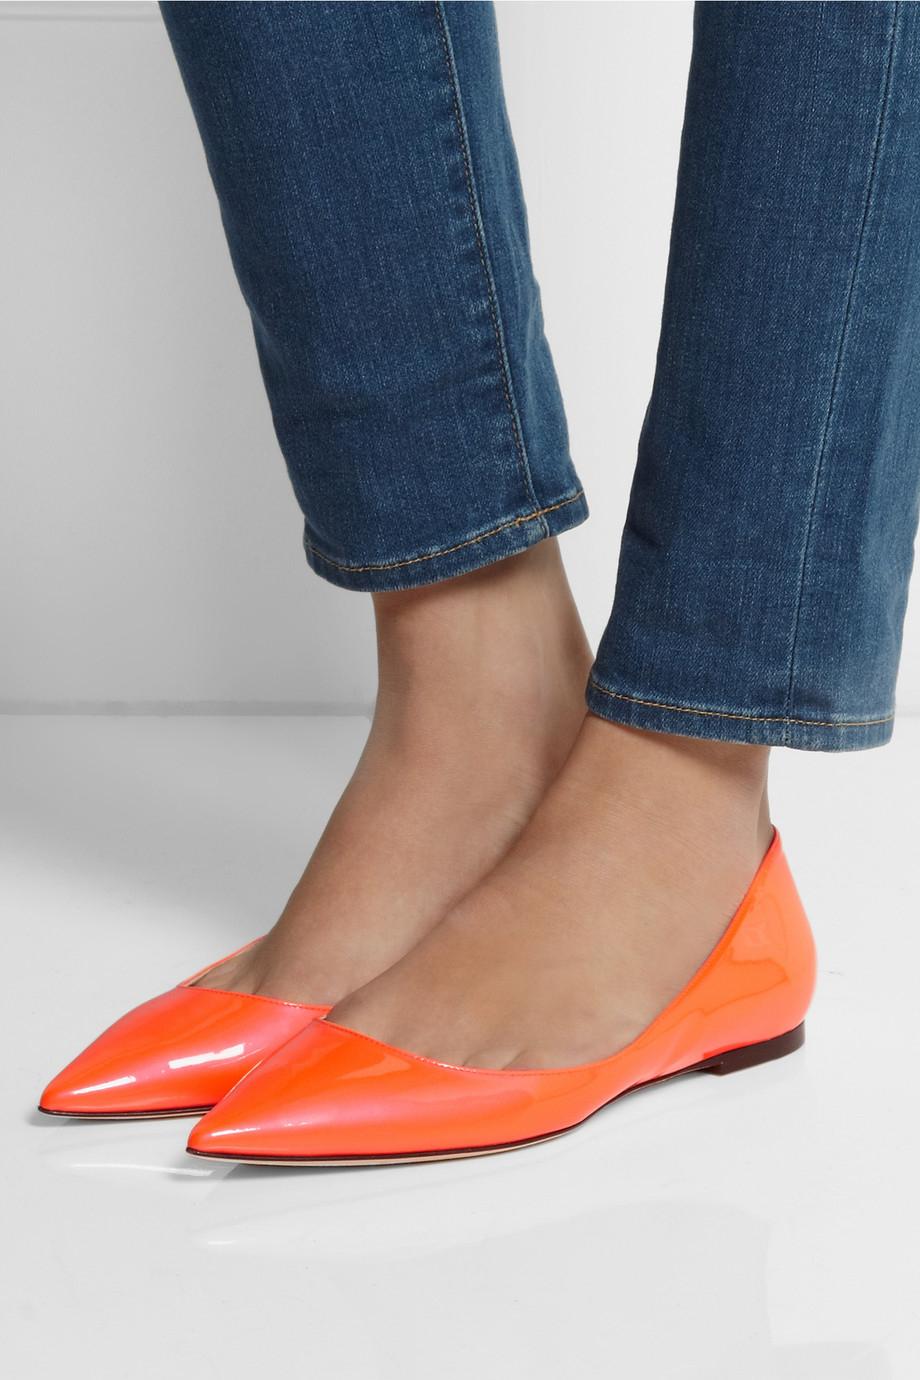 742a5e8c7e2 Lyst - Jimmy Choo Alina Neon Patentleather Pointtoe Flats in Orange